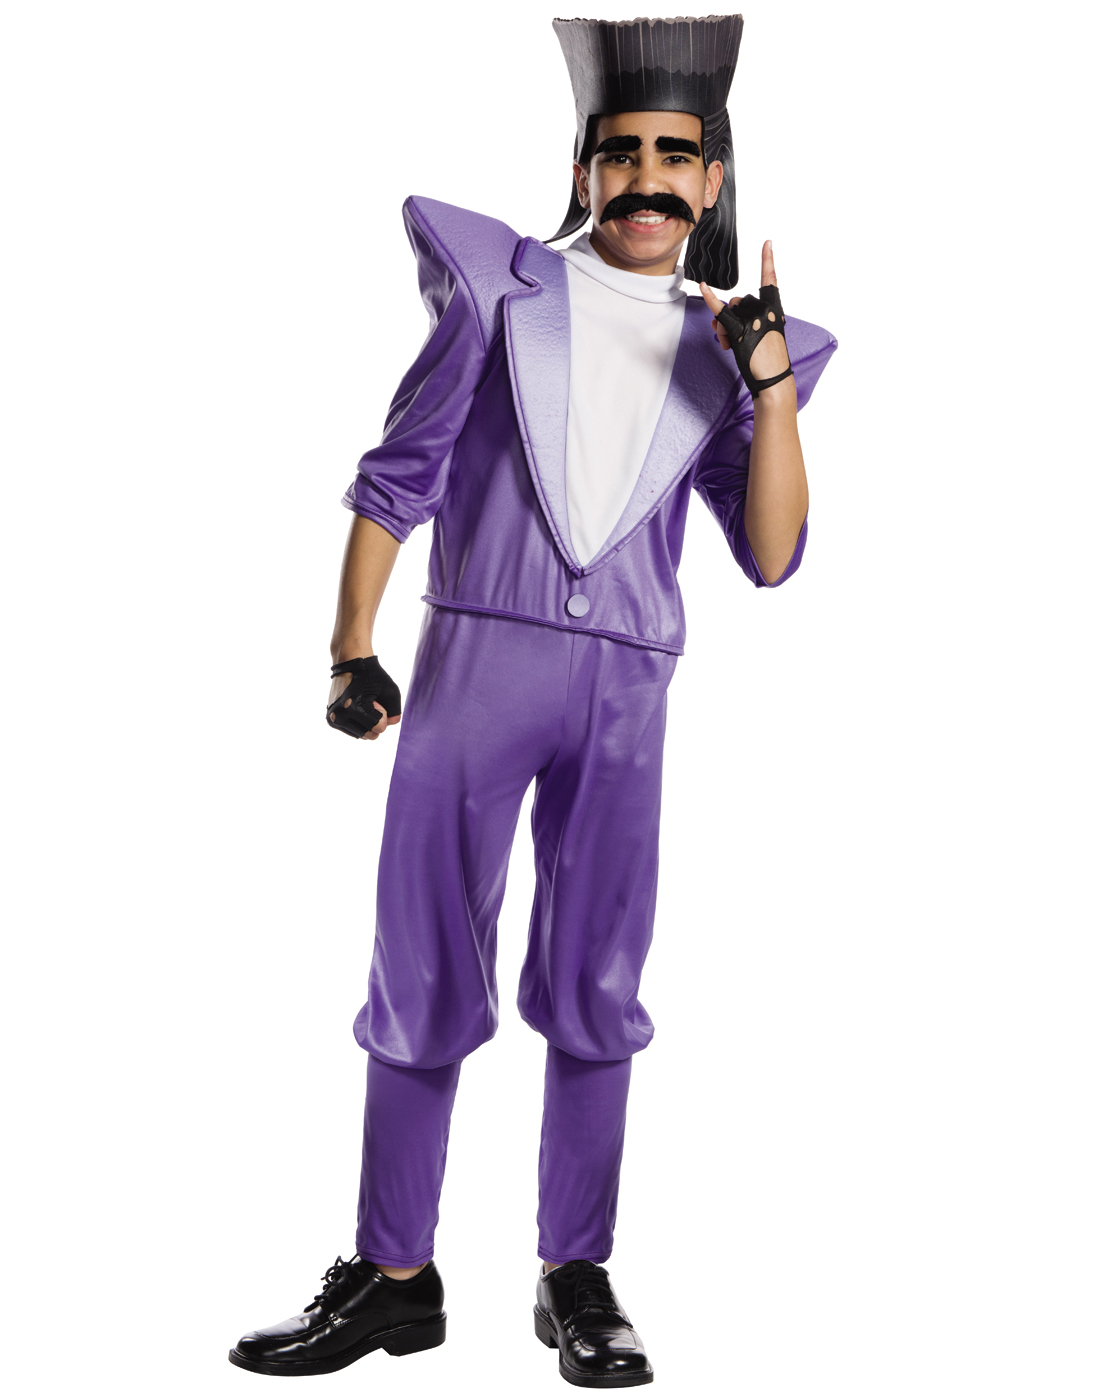 Despicable Me 3 Balthazar Bratt Boy Childs Villain Halloween Costume